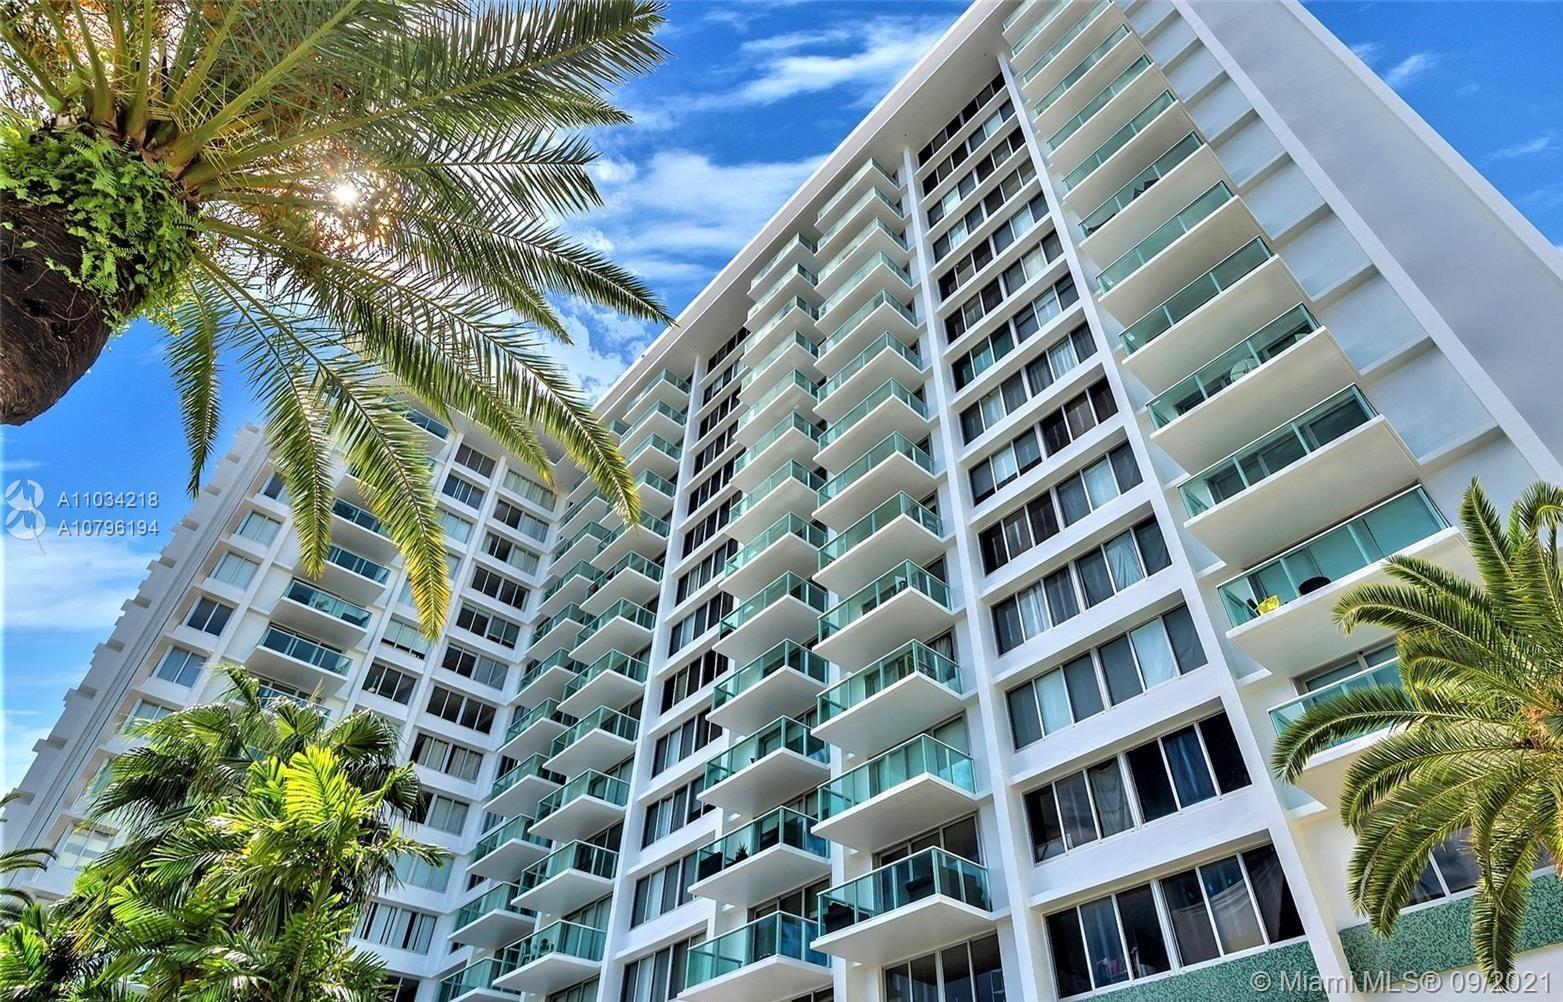 Mirador South #423 - 1000 West Ave #423, Miami Beach, FL 33139